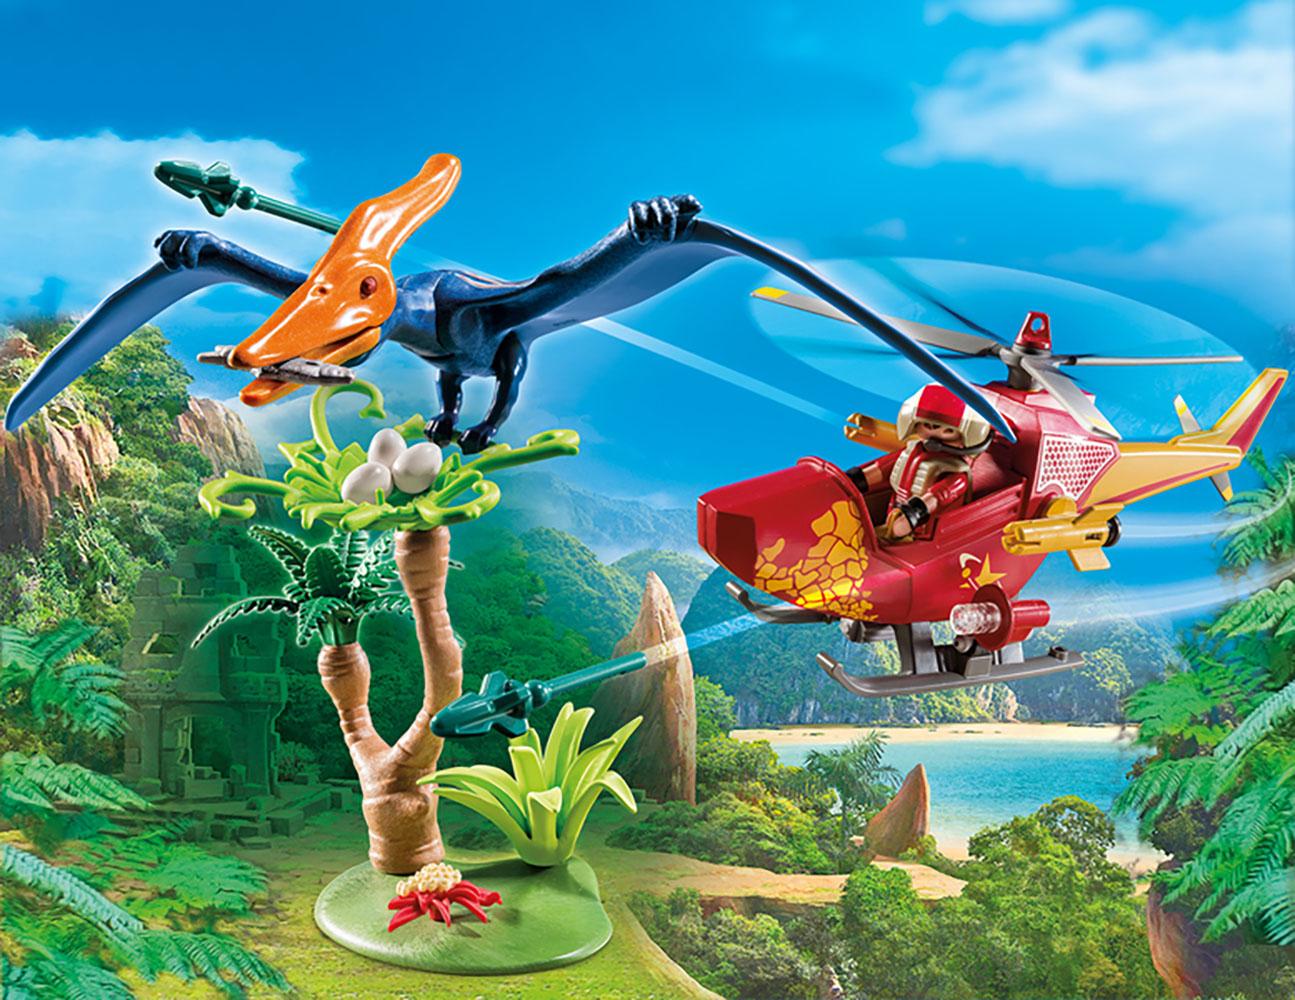 The Explorers - Hélicoptère et ptéranodon